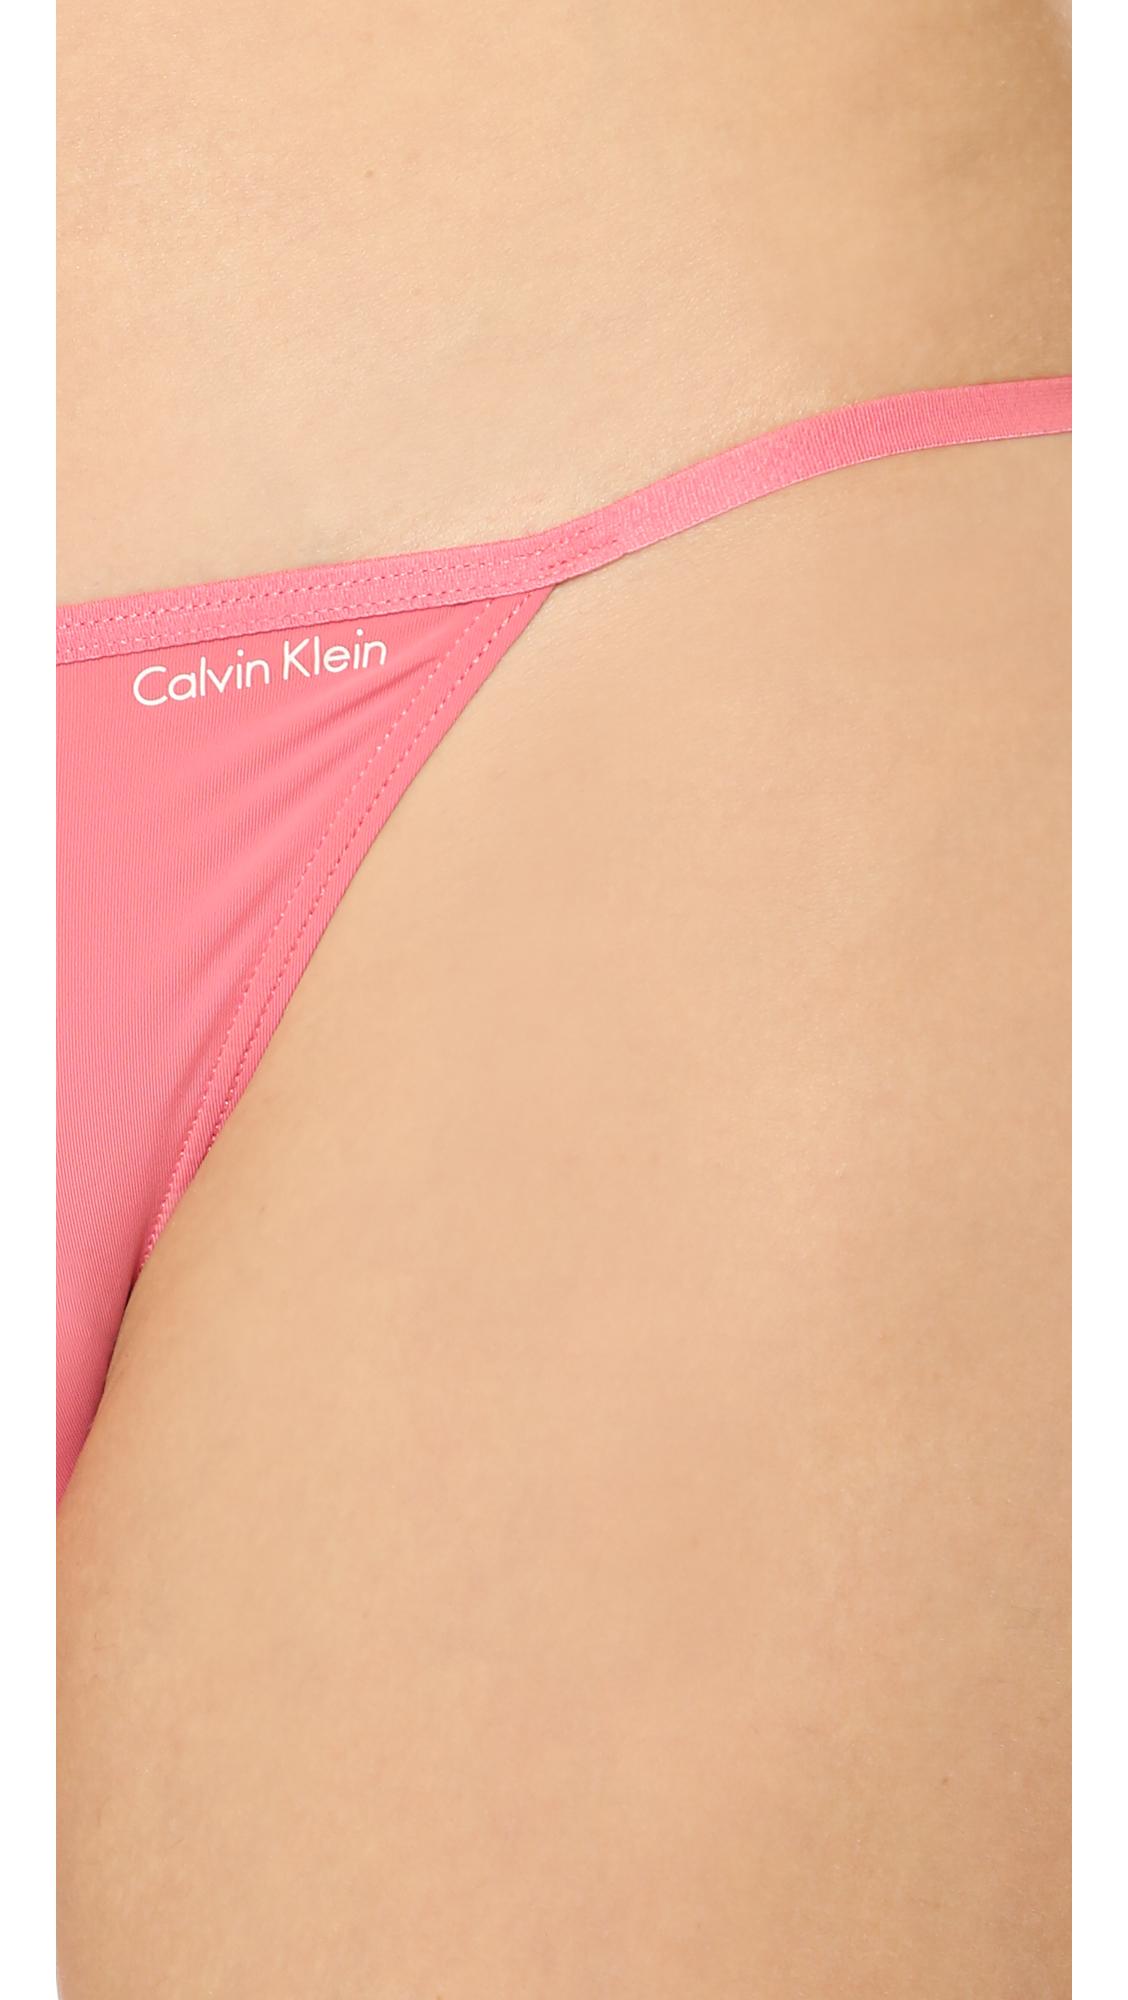 90a1690d7d6 Calvin Klein Sleek String Bikini Panties - Purity in Pink - Lyst